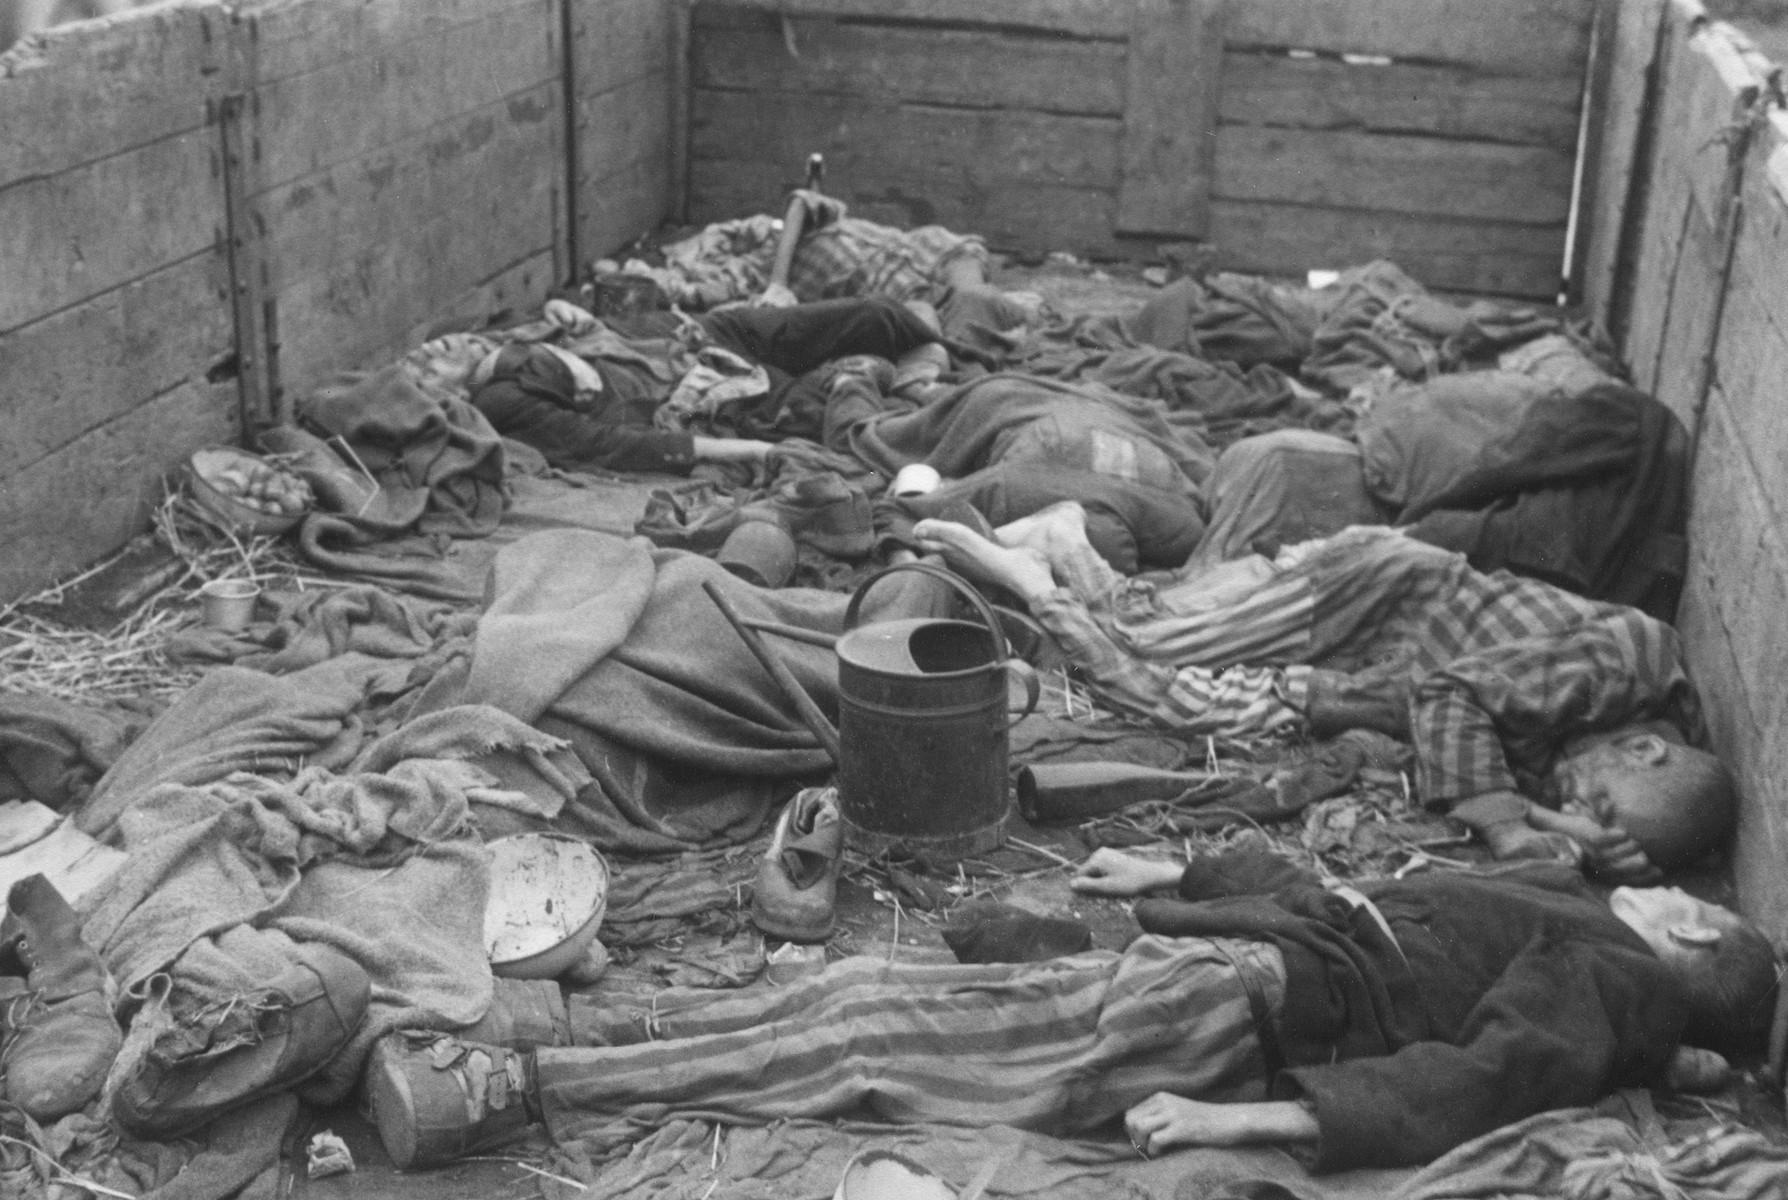 Corpses in a death train in Dachau.